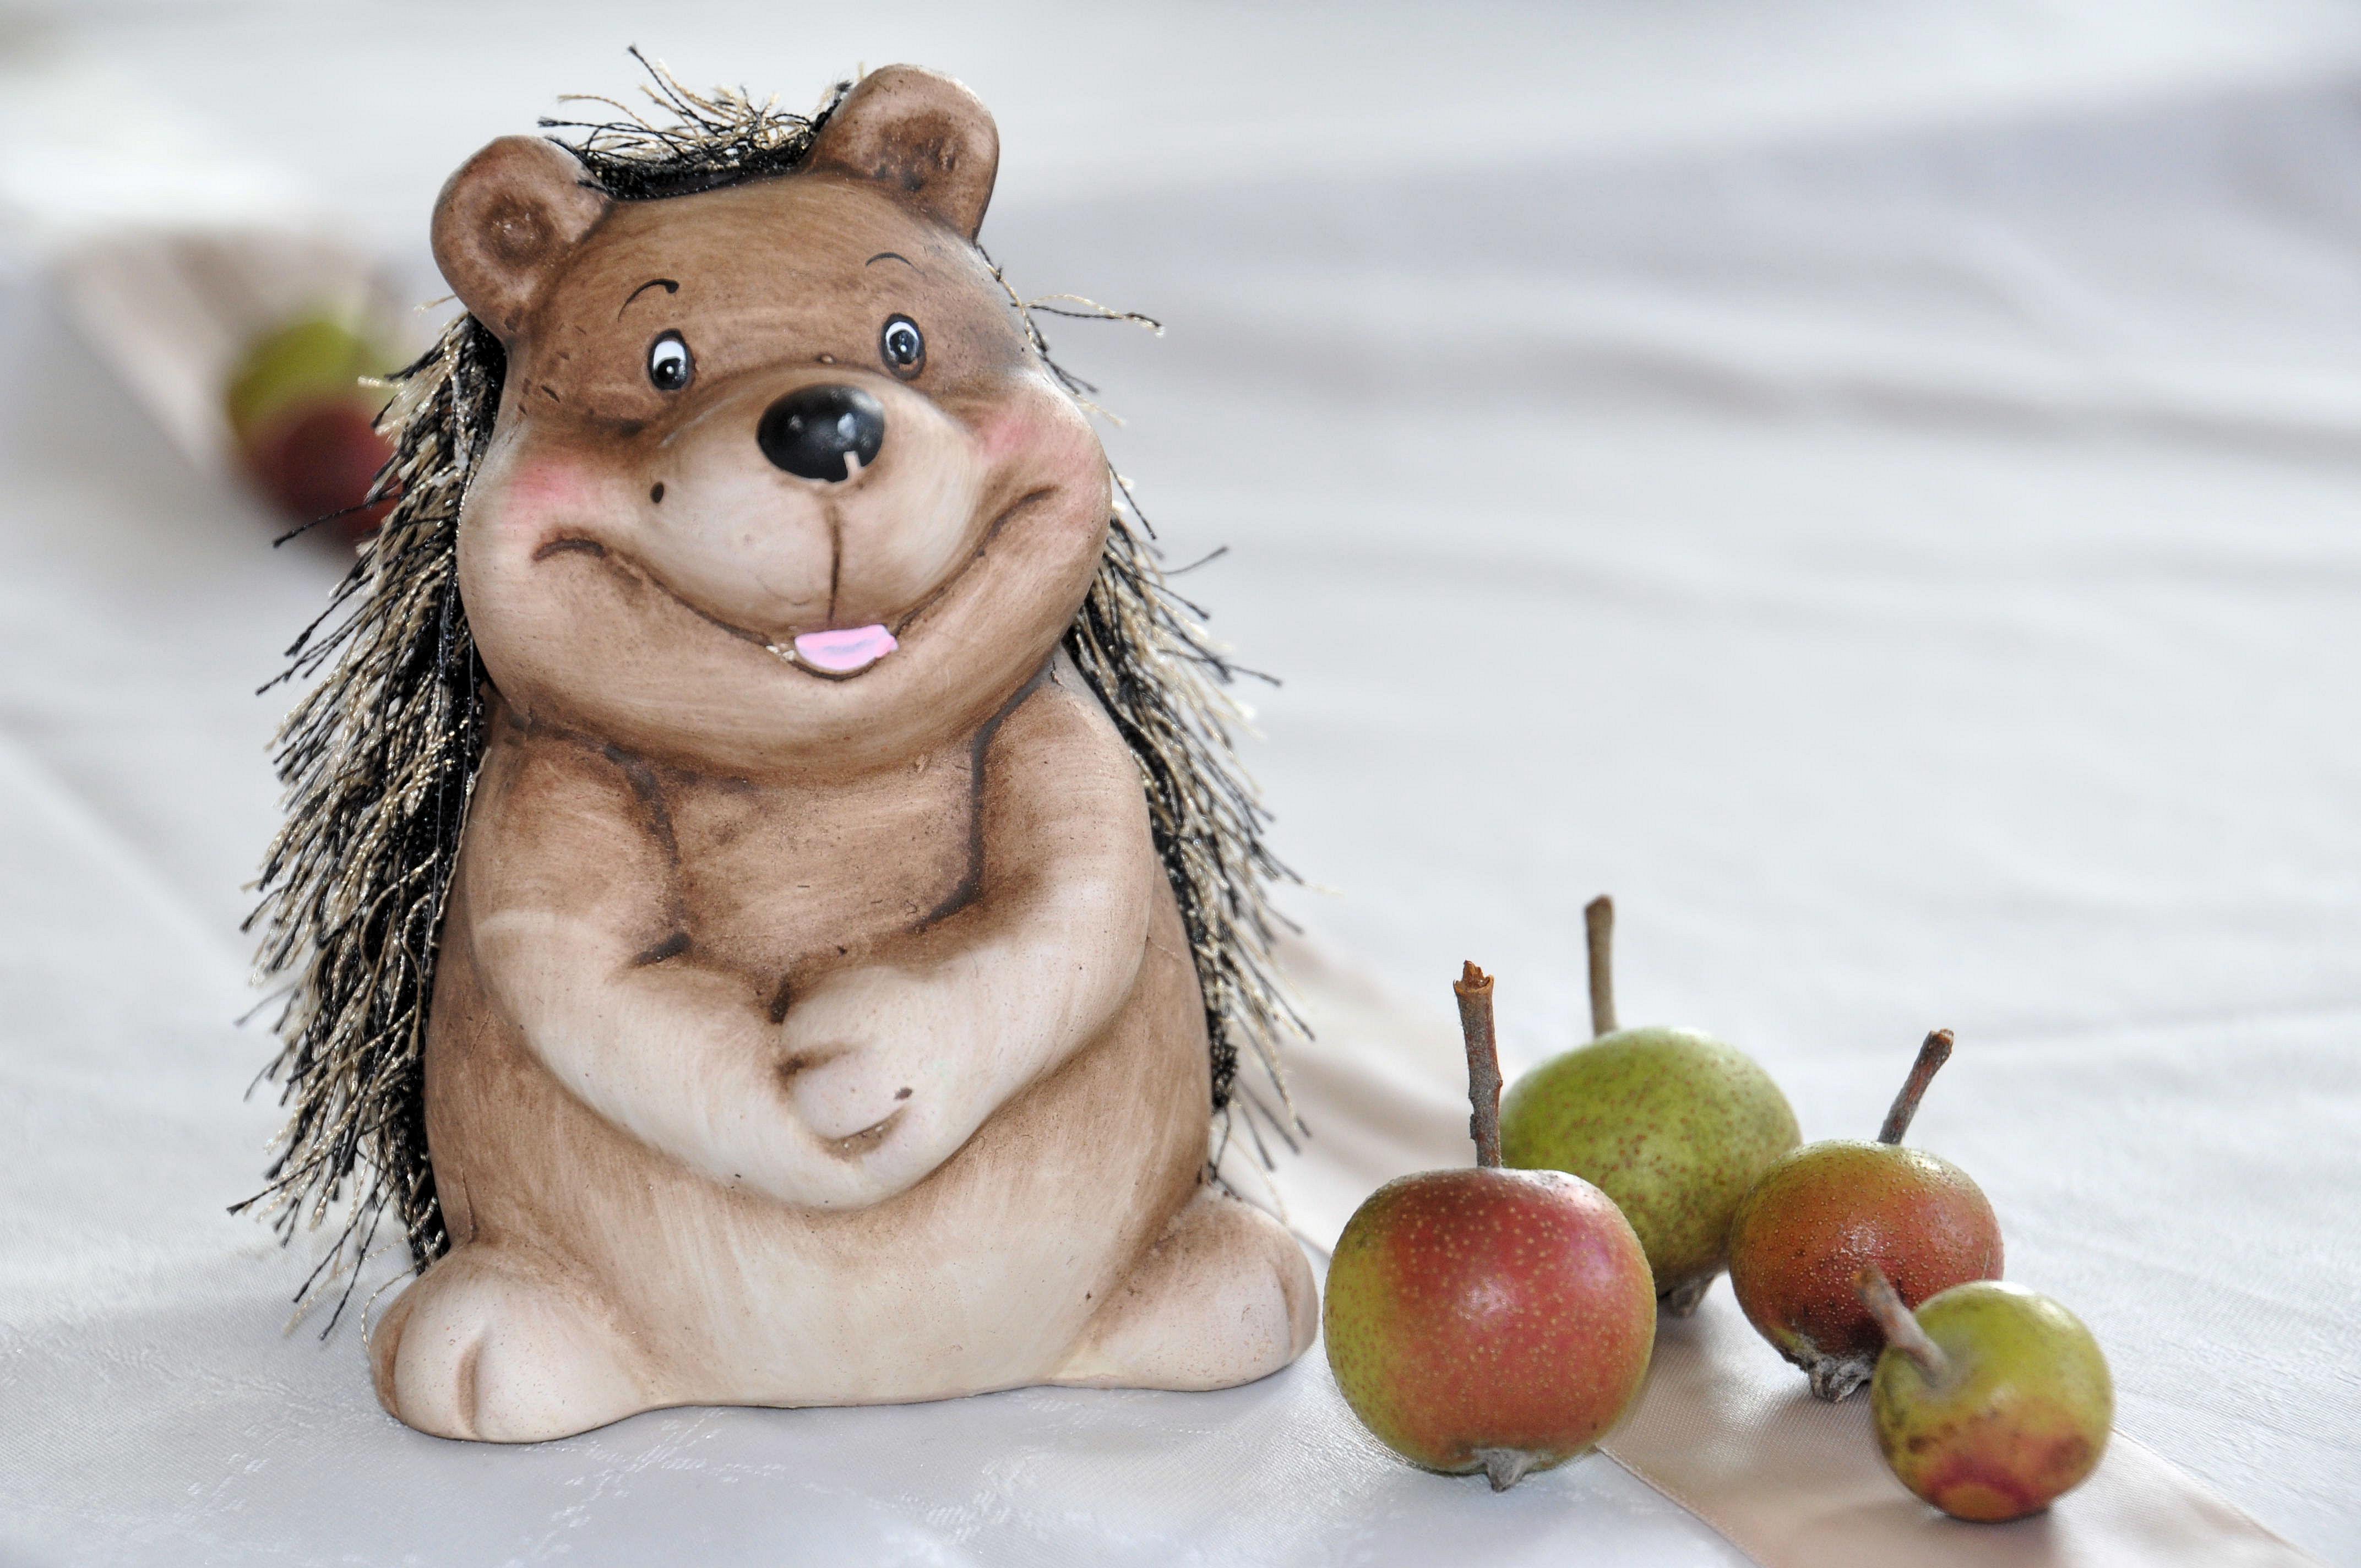 Äpfel SinnSationsGeschichten © Praxis Der Zuhörer - Steffen Zöhl - Charlottenburg